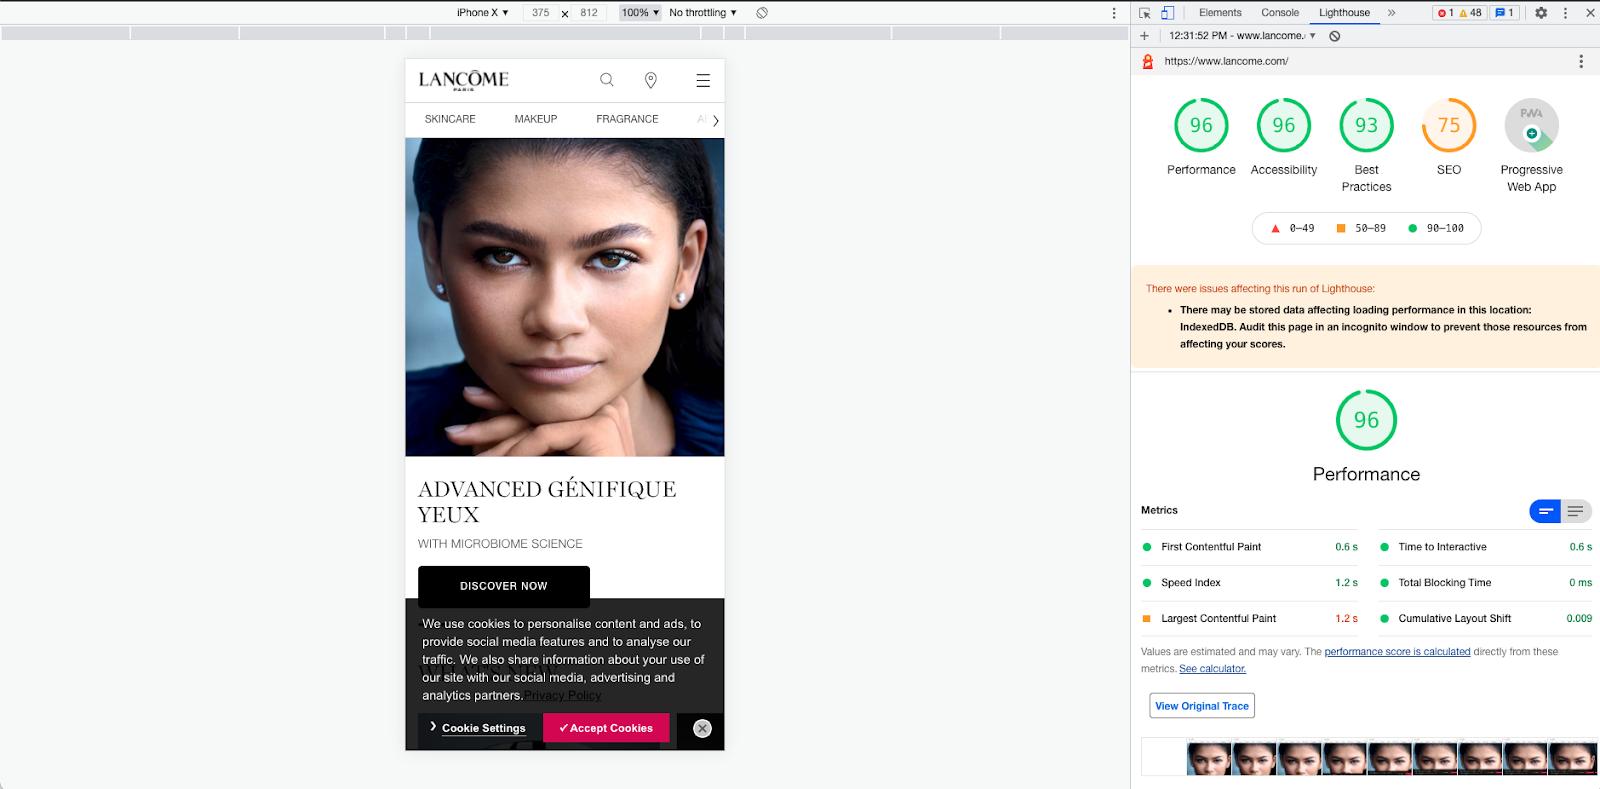 A Lighthouse audit of the Lancôme website